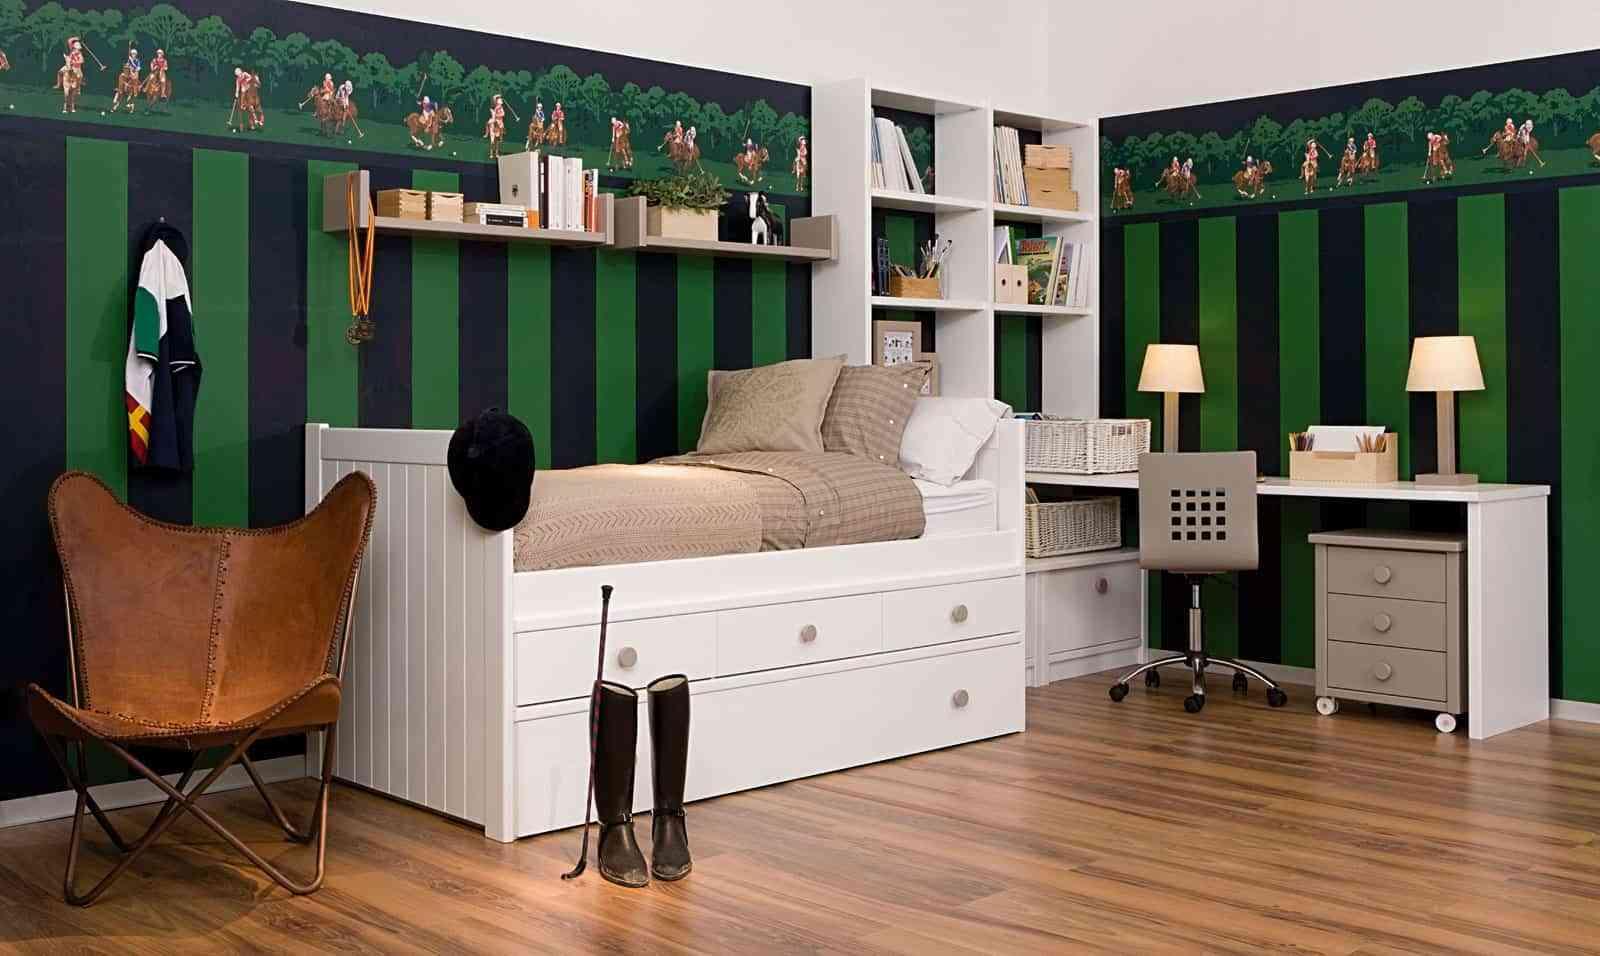 Dormitorios juveniles de dise o moderno a los que no podr - Decoracion de paredes de dormitorios juveniles ...